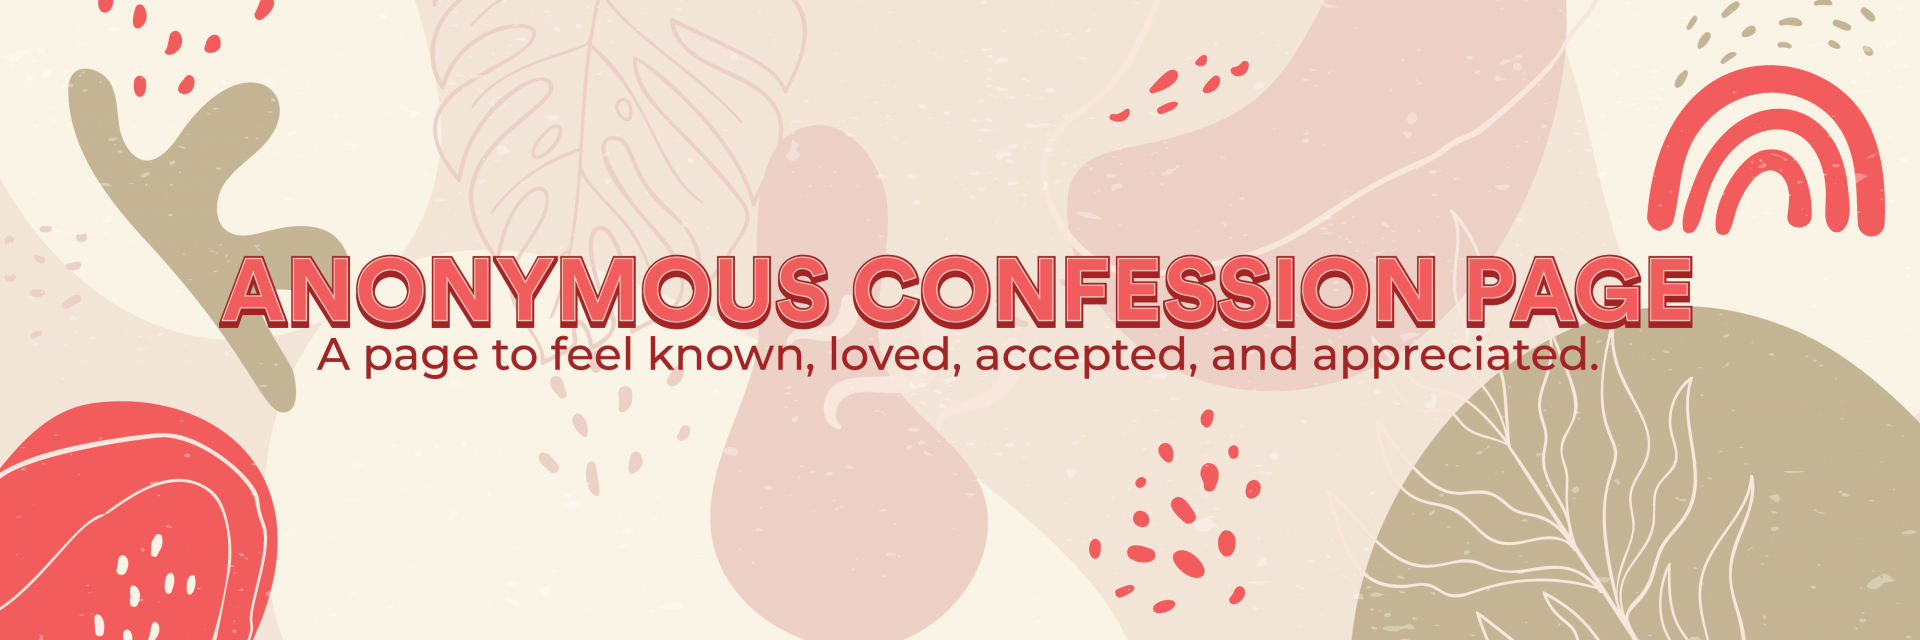 confession page-02